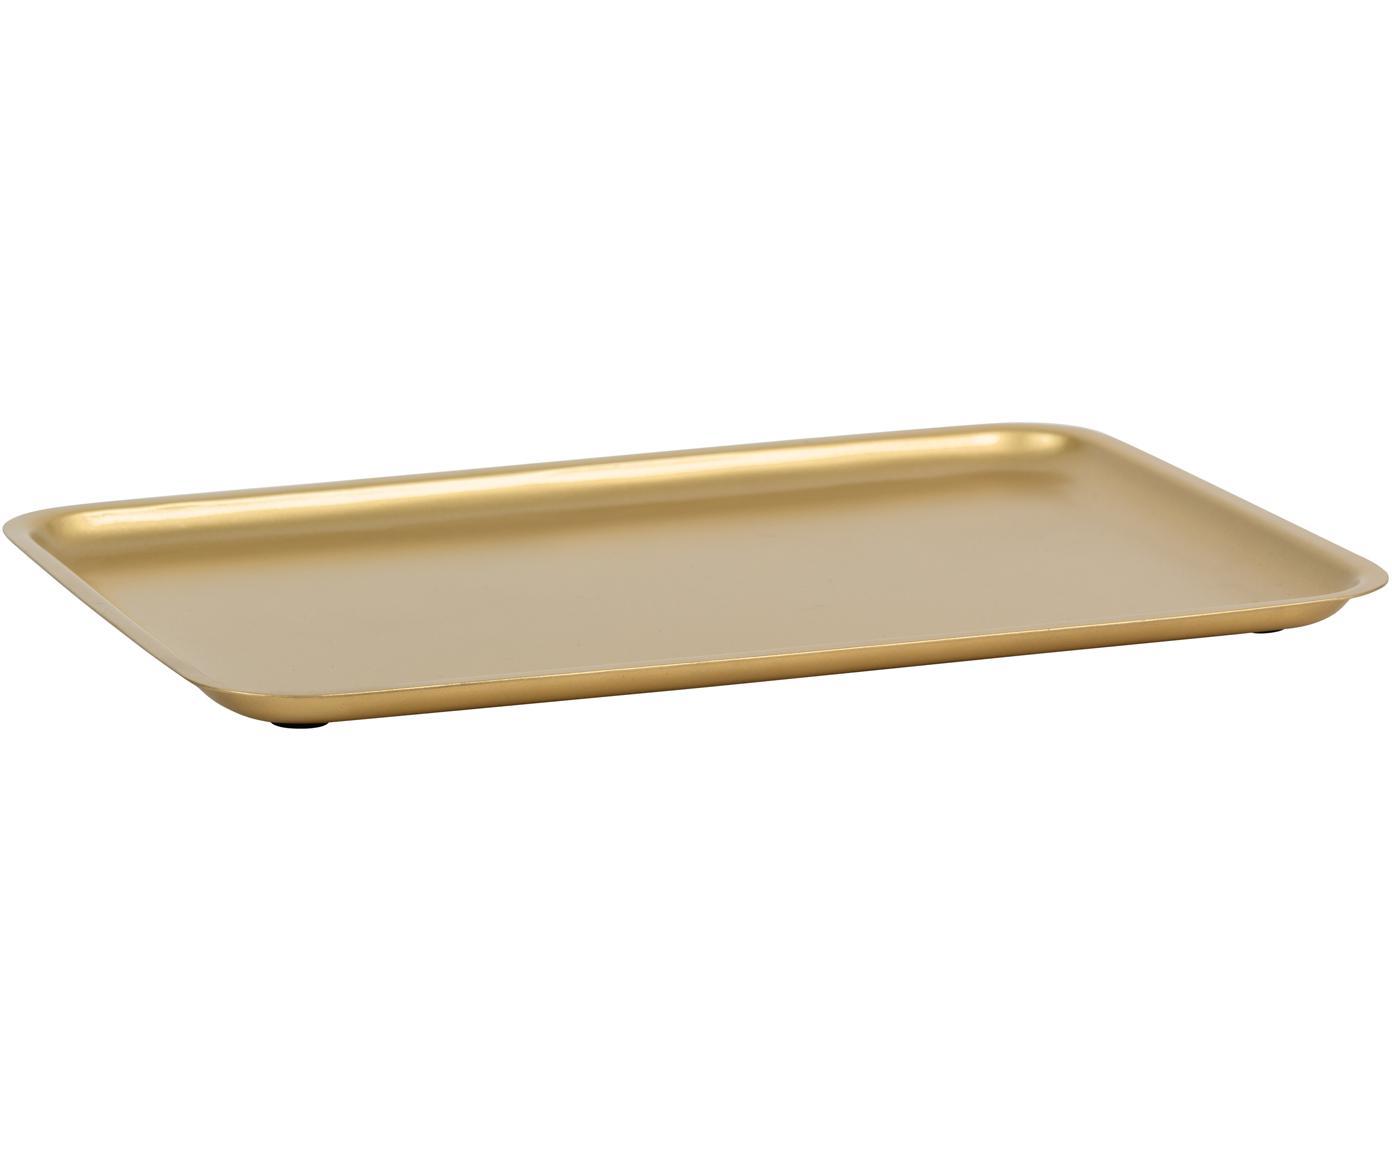 Vassoio dorato Good Morning, Metallo rivestito, Ottonato, Larg. 34 x Prof. 23 cm